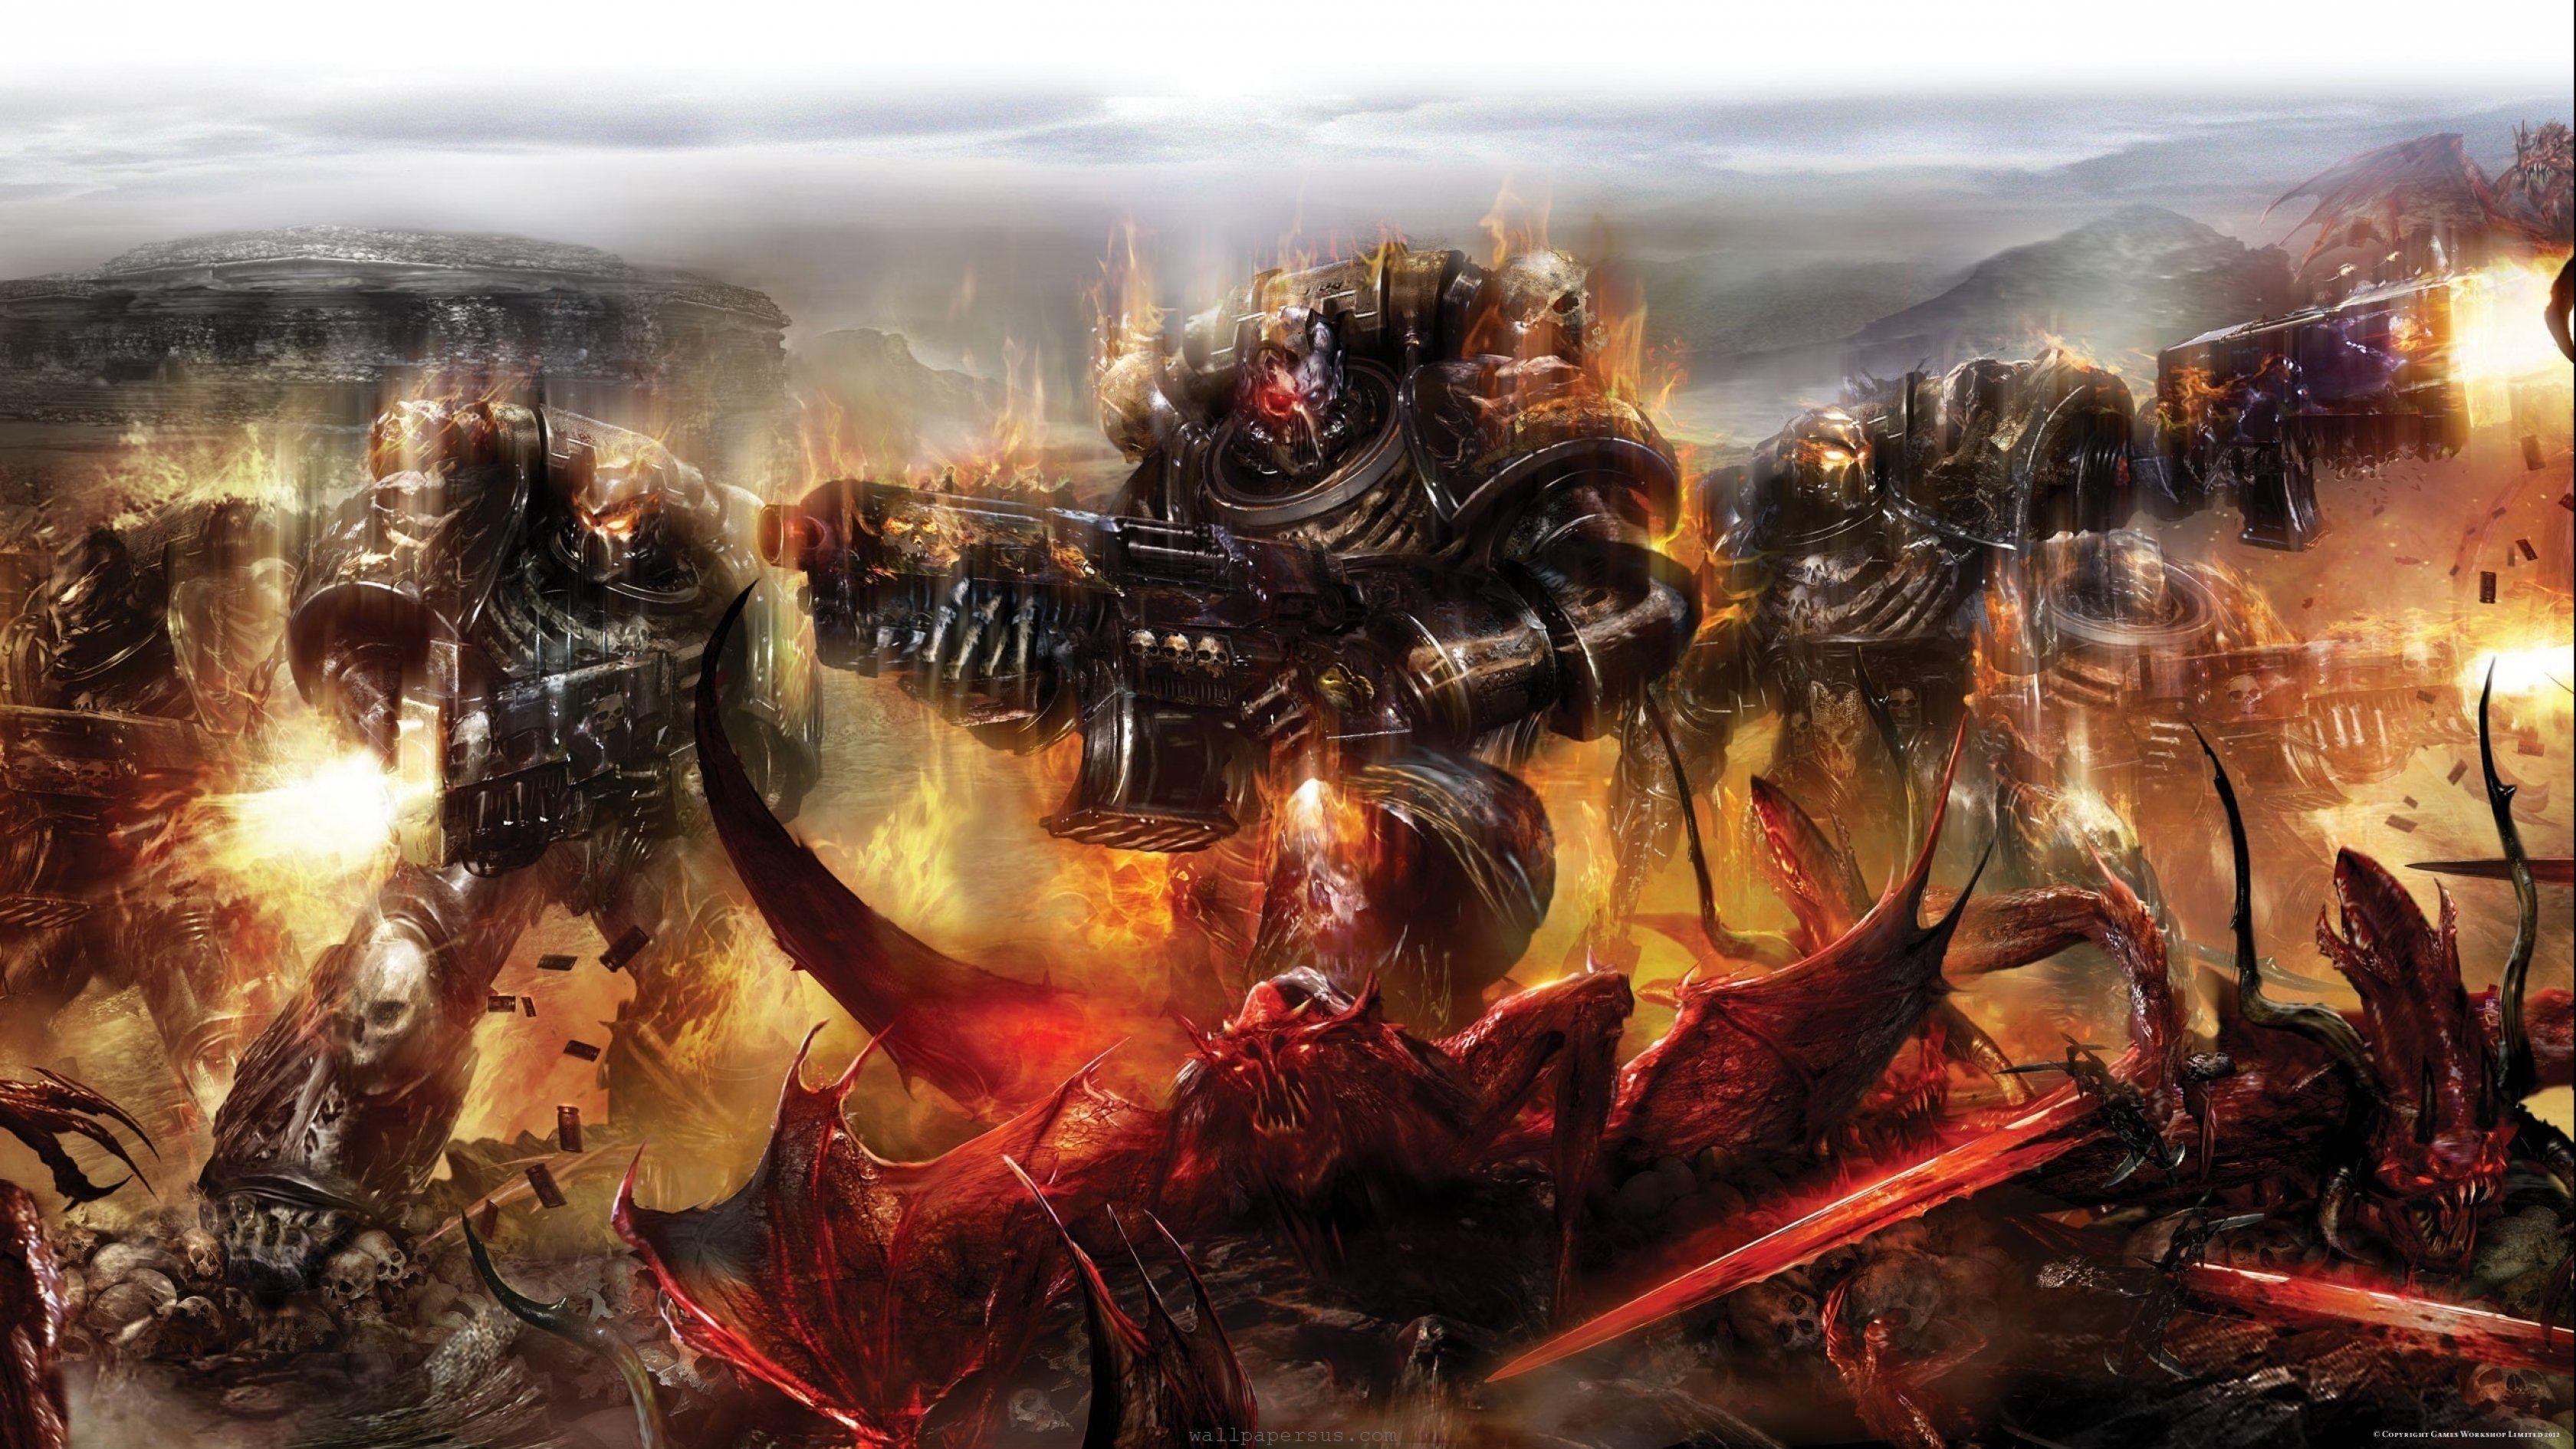 Wh40k Legion Of The Damned Wallpapers Warhammer Warhammer 40k Warhammer Art